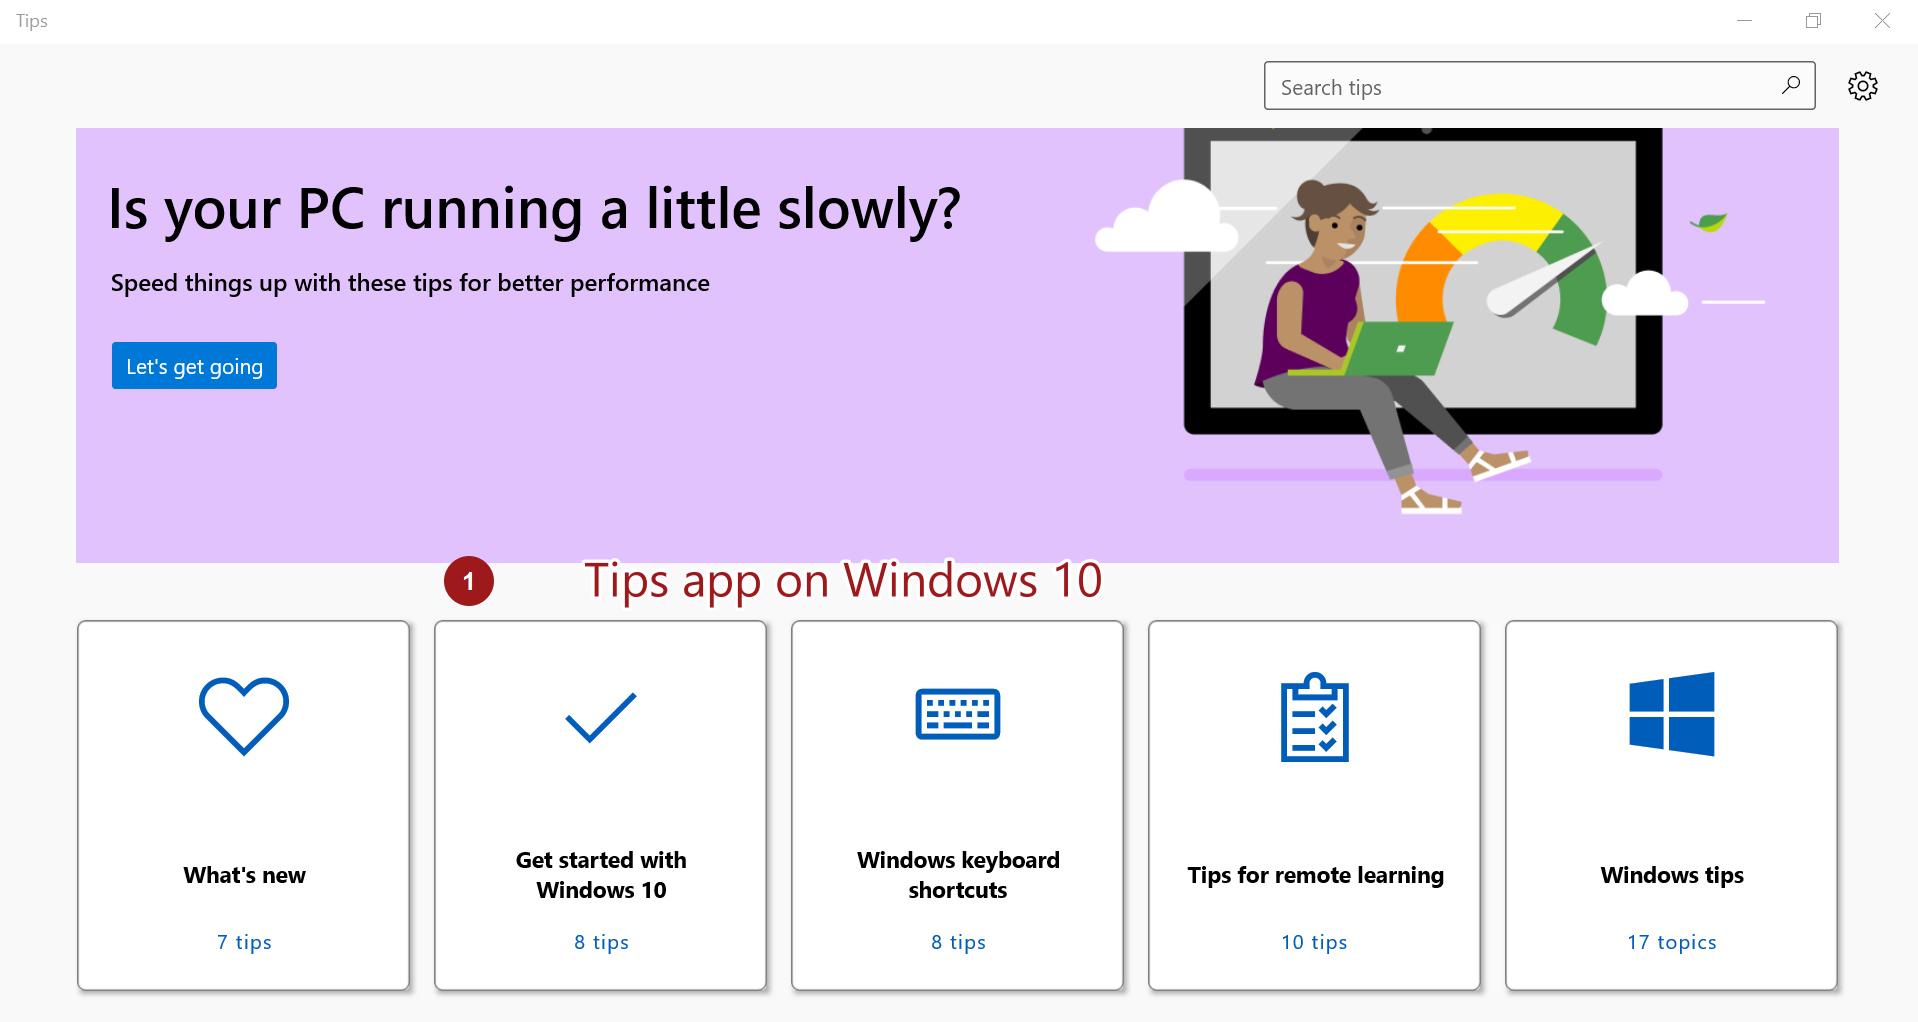 Tips App on Windows 10